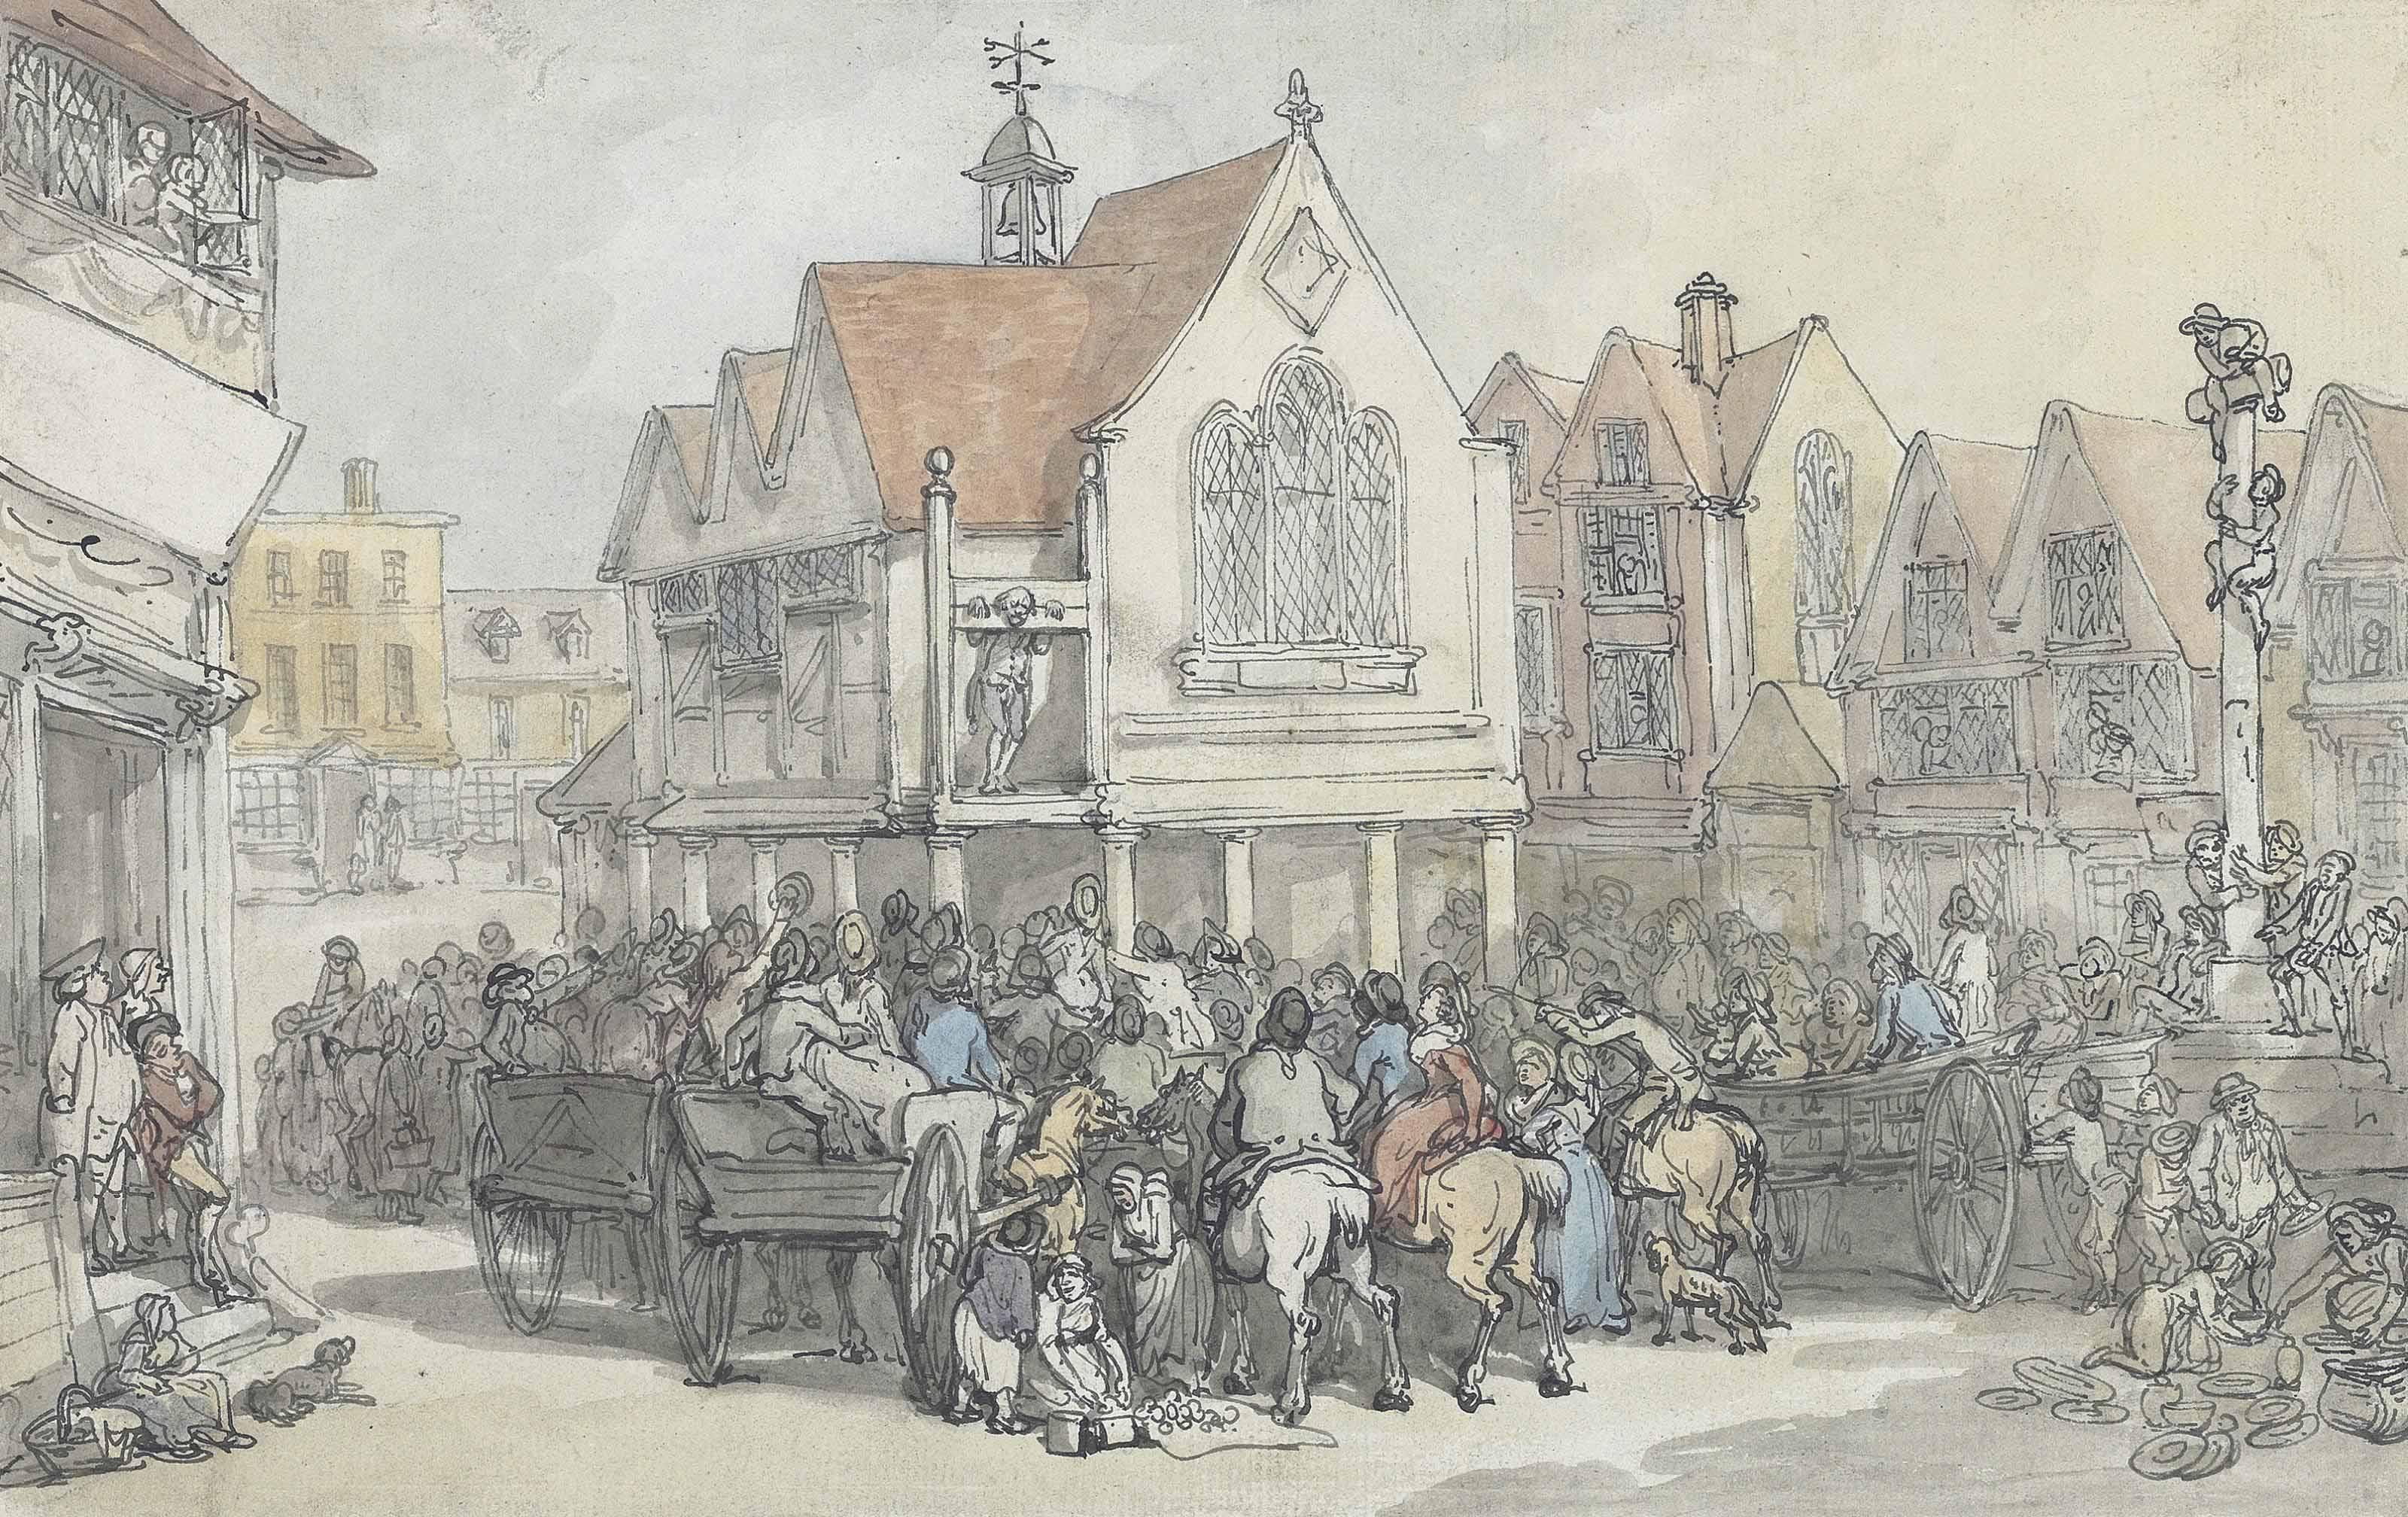 Thomas Rowlandson (London 1756-1827)